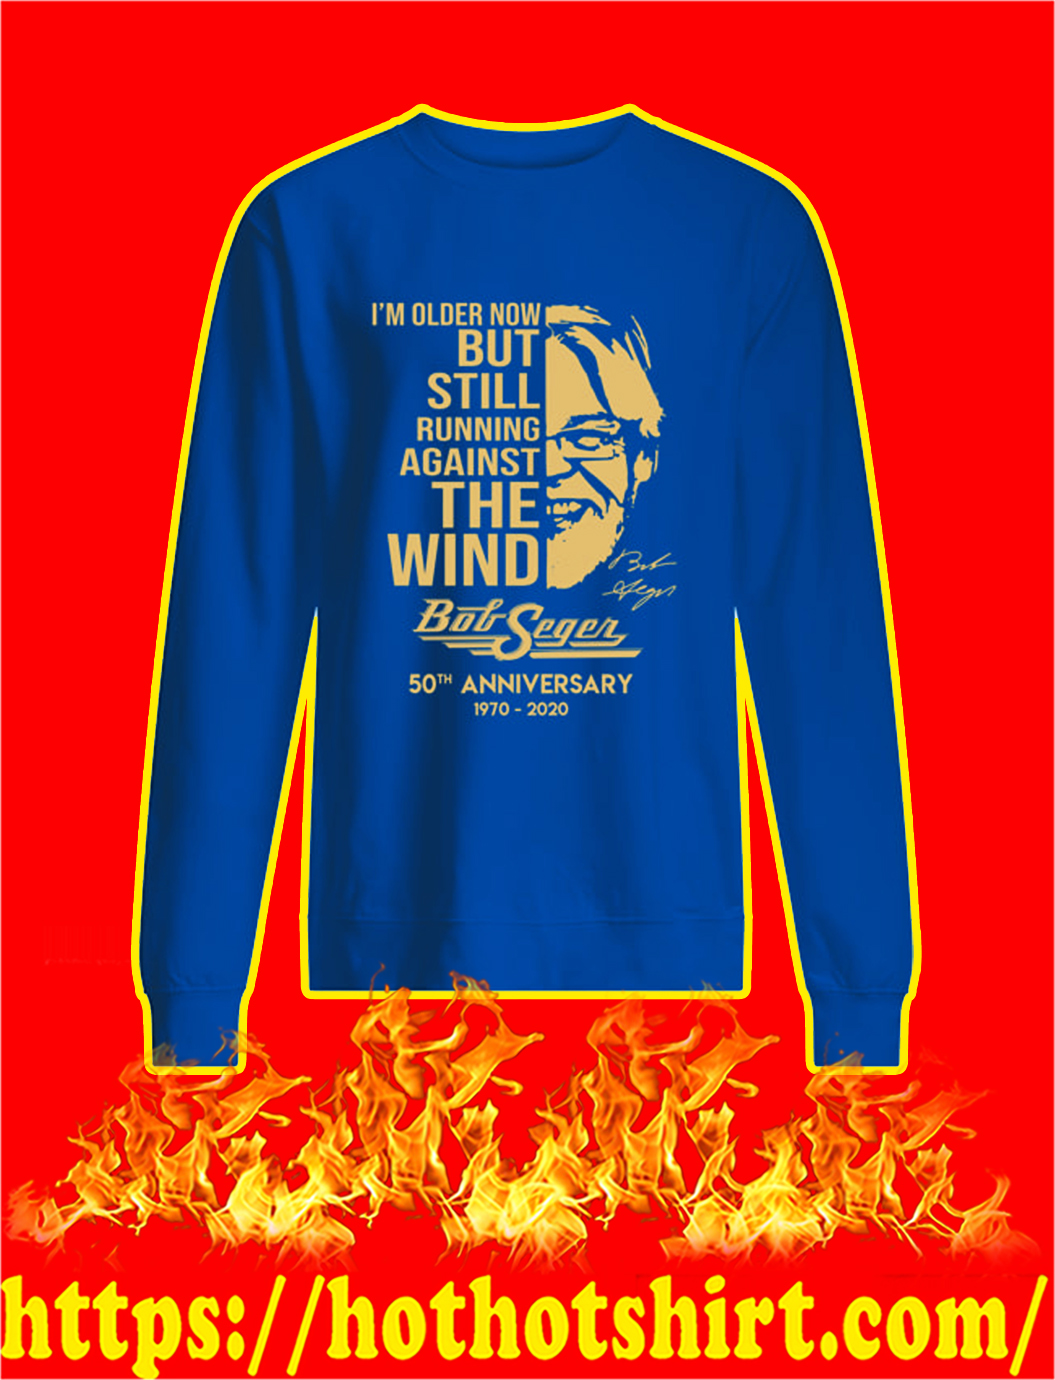 Bob Seger I'm Older Now But Still Running Against The Wind sweatshirt